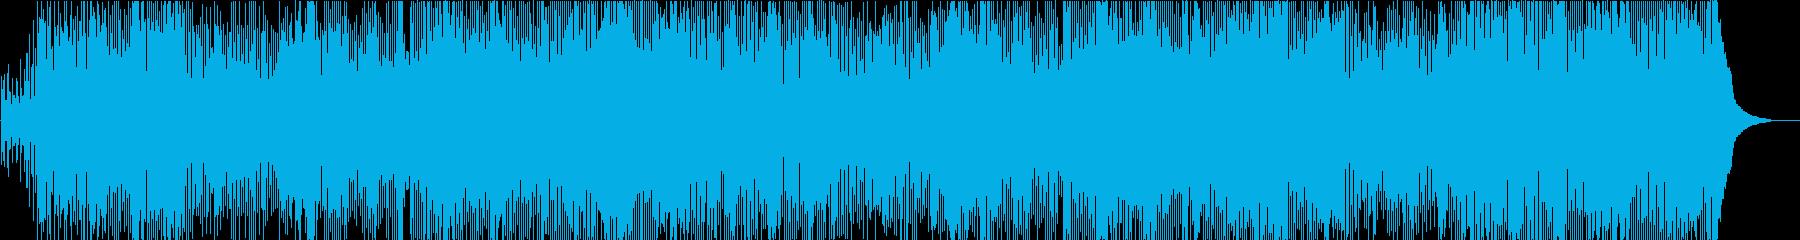 New Songの再生済みの波形